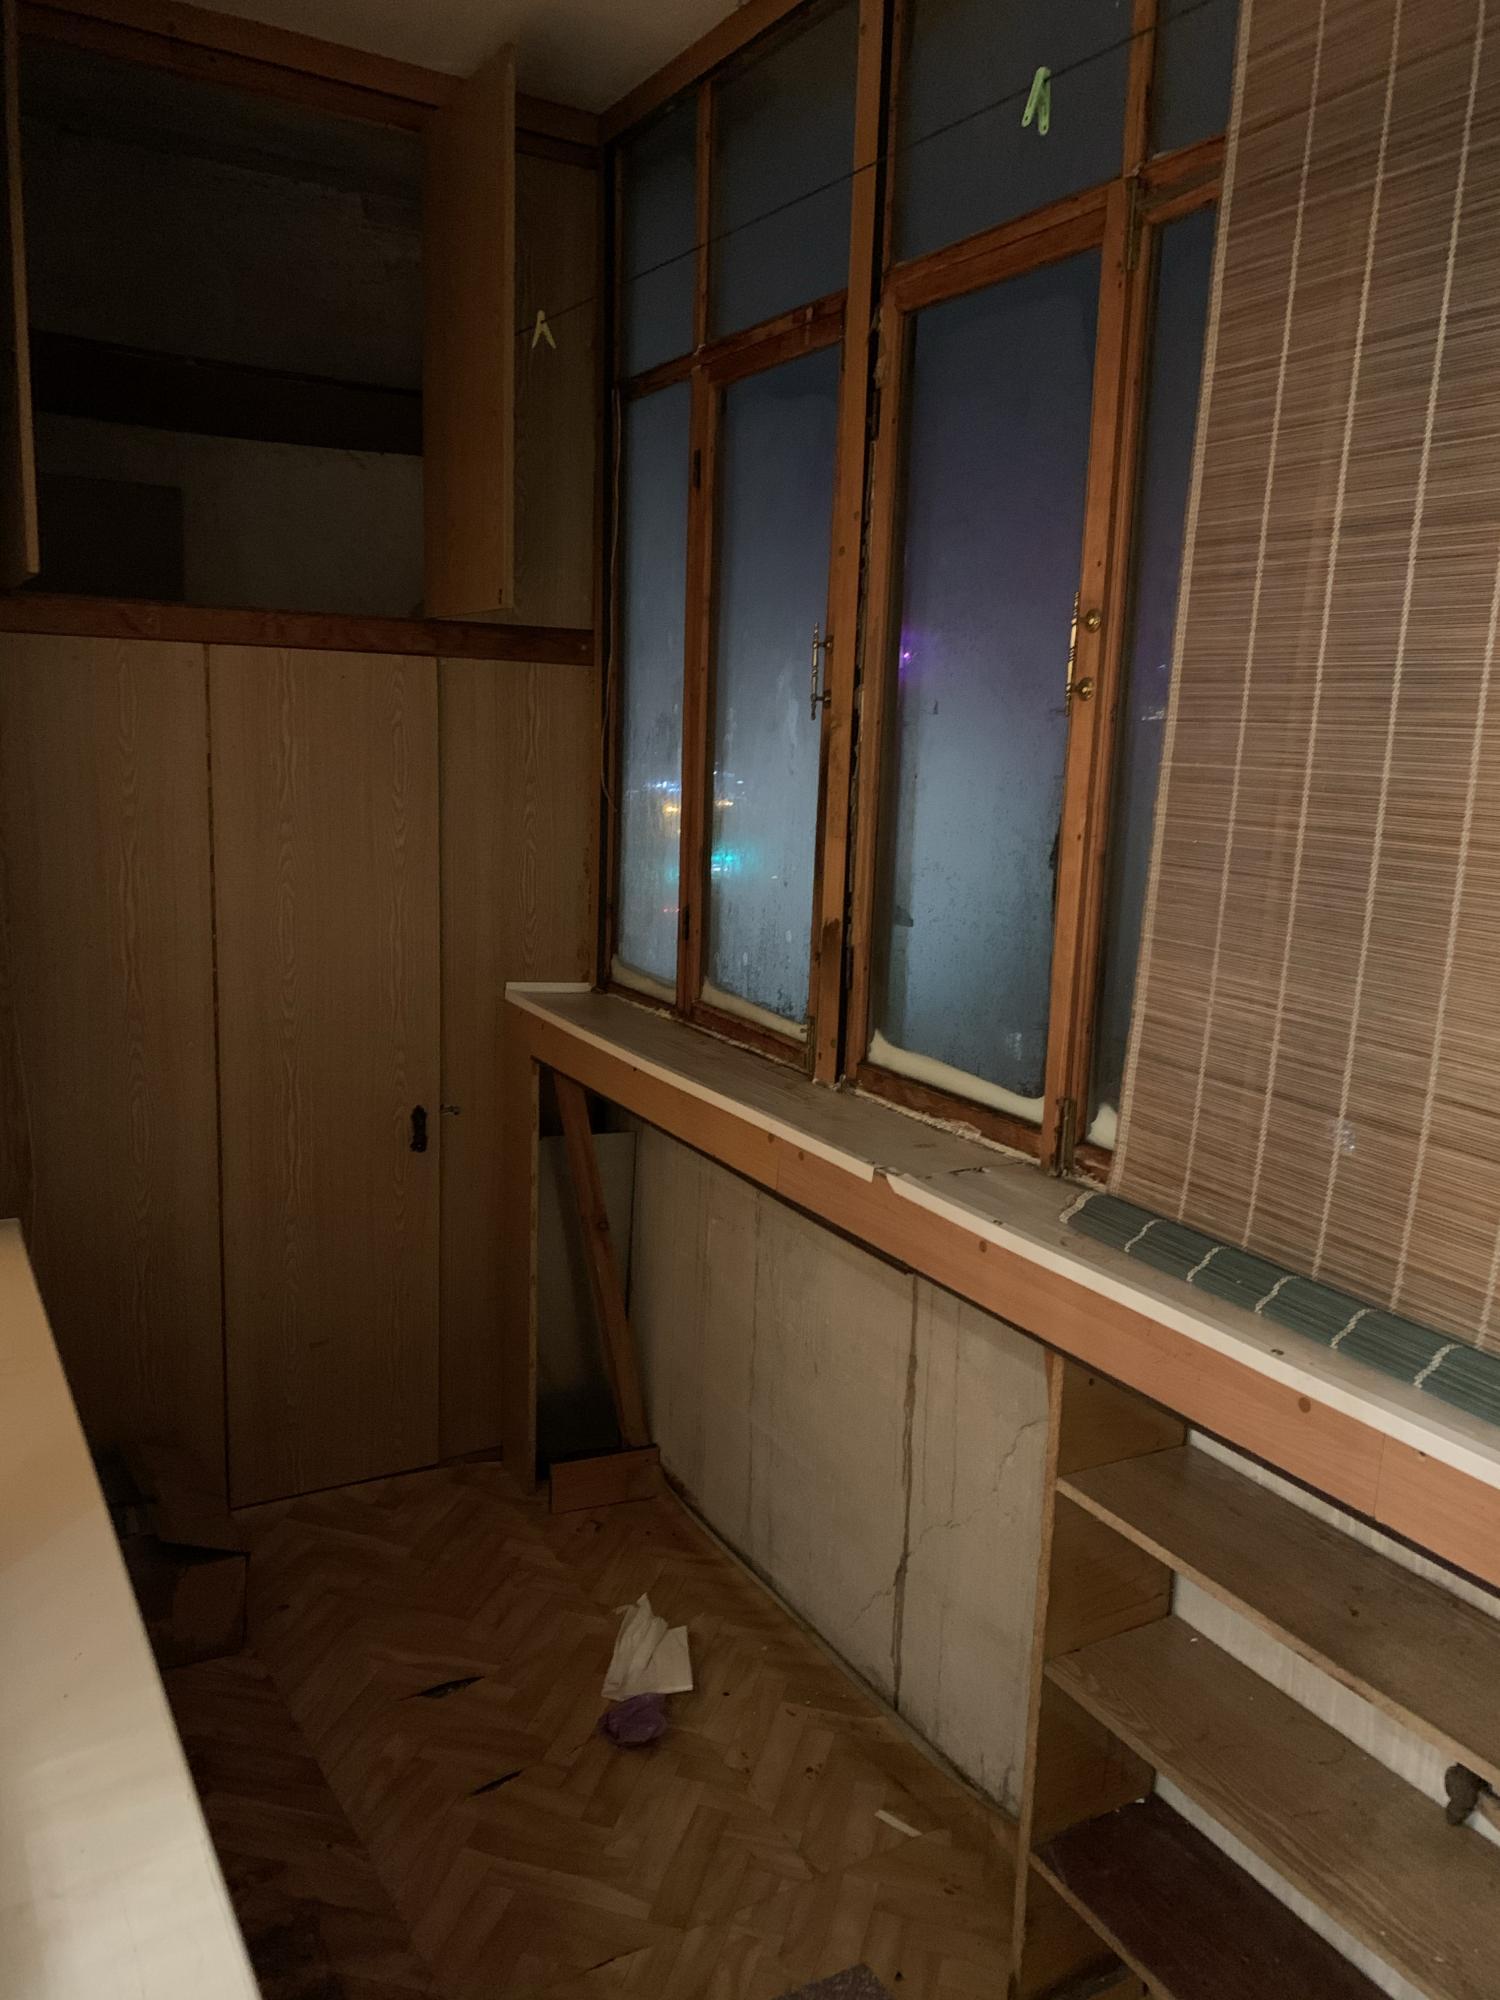 3к квартира проспект Металлургов, 13А | 20000 | аренда в Красноярске фото 8